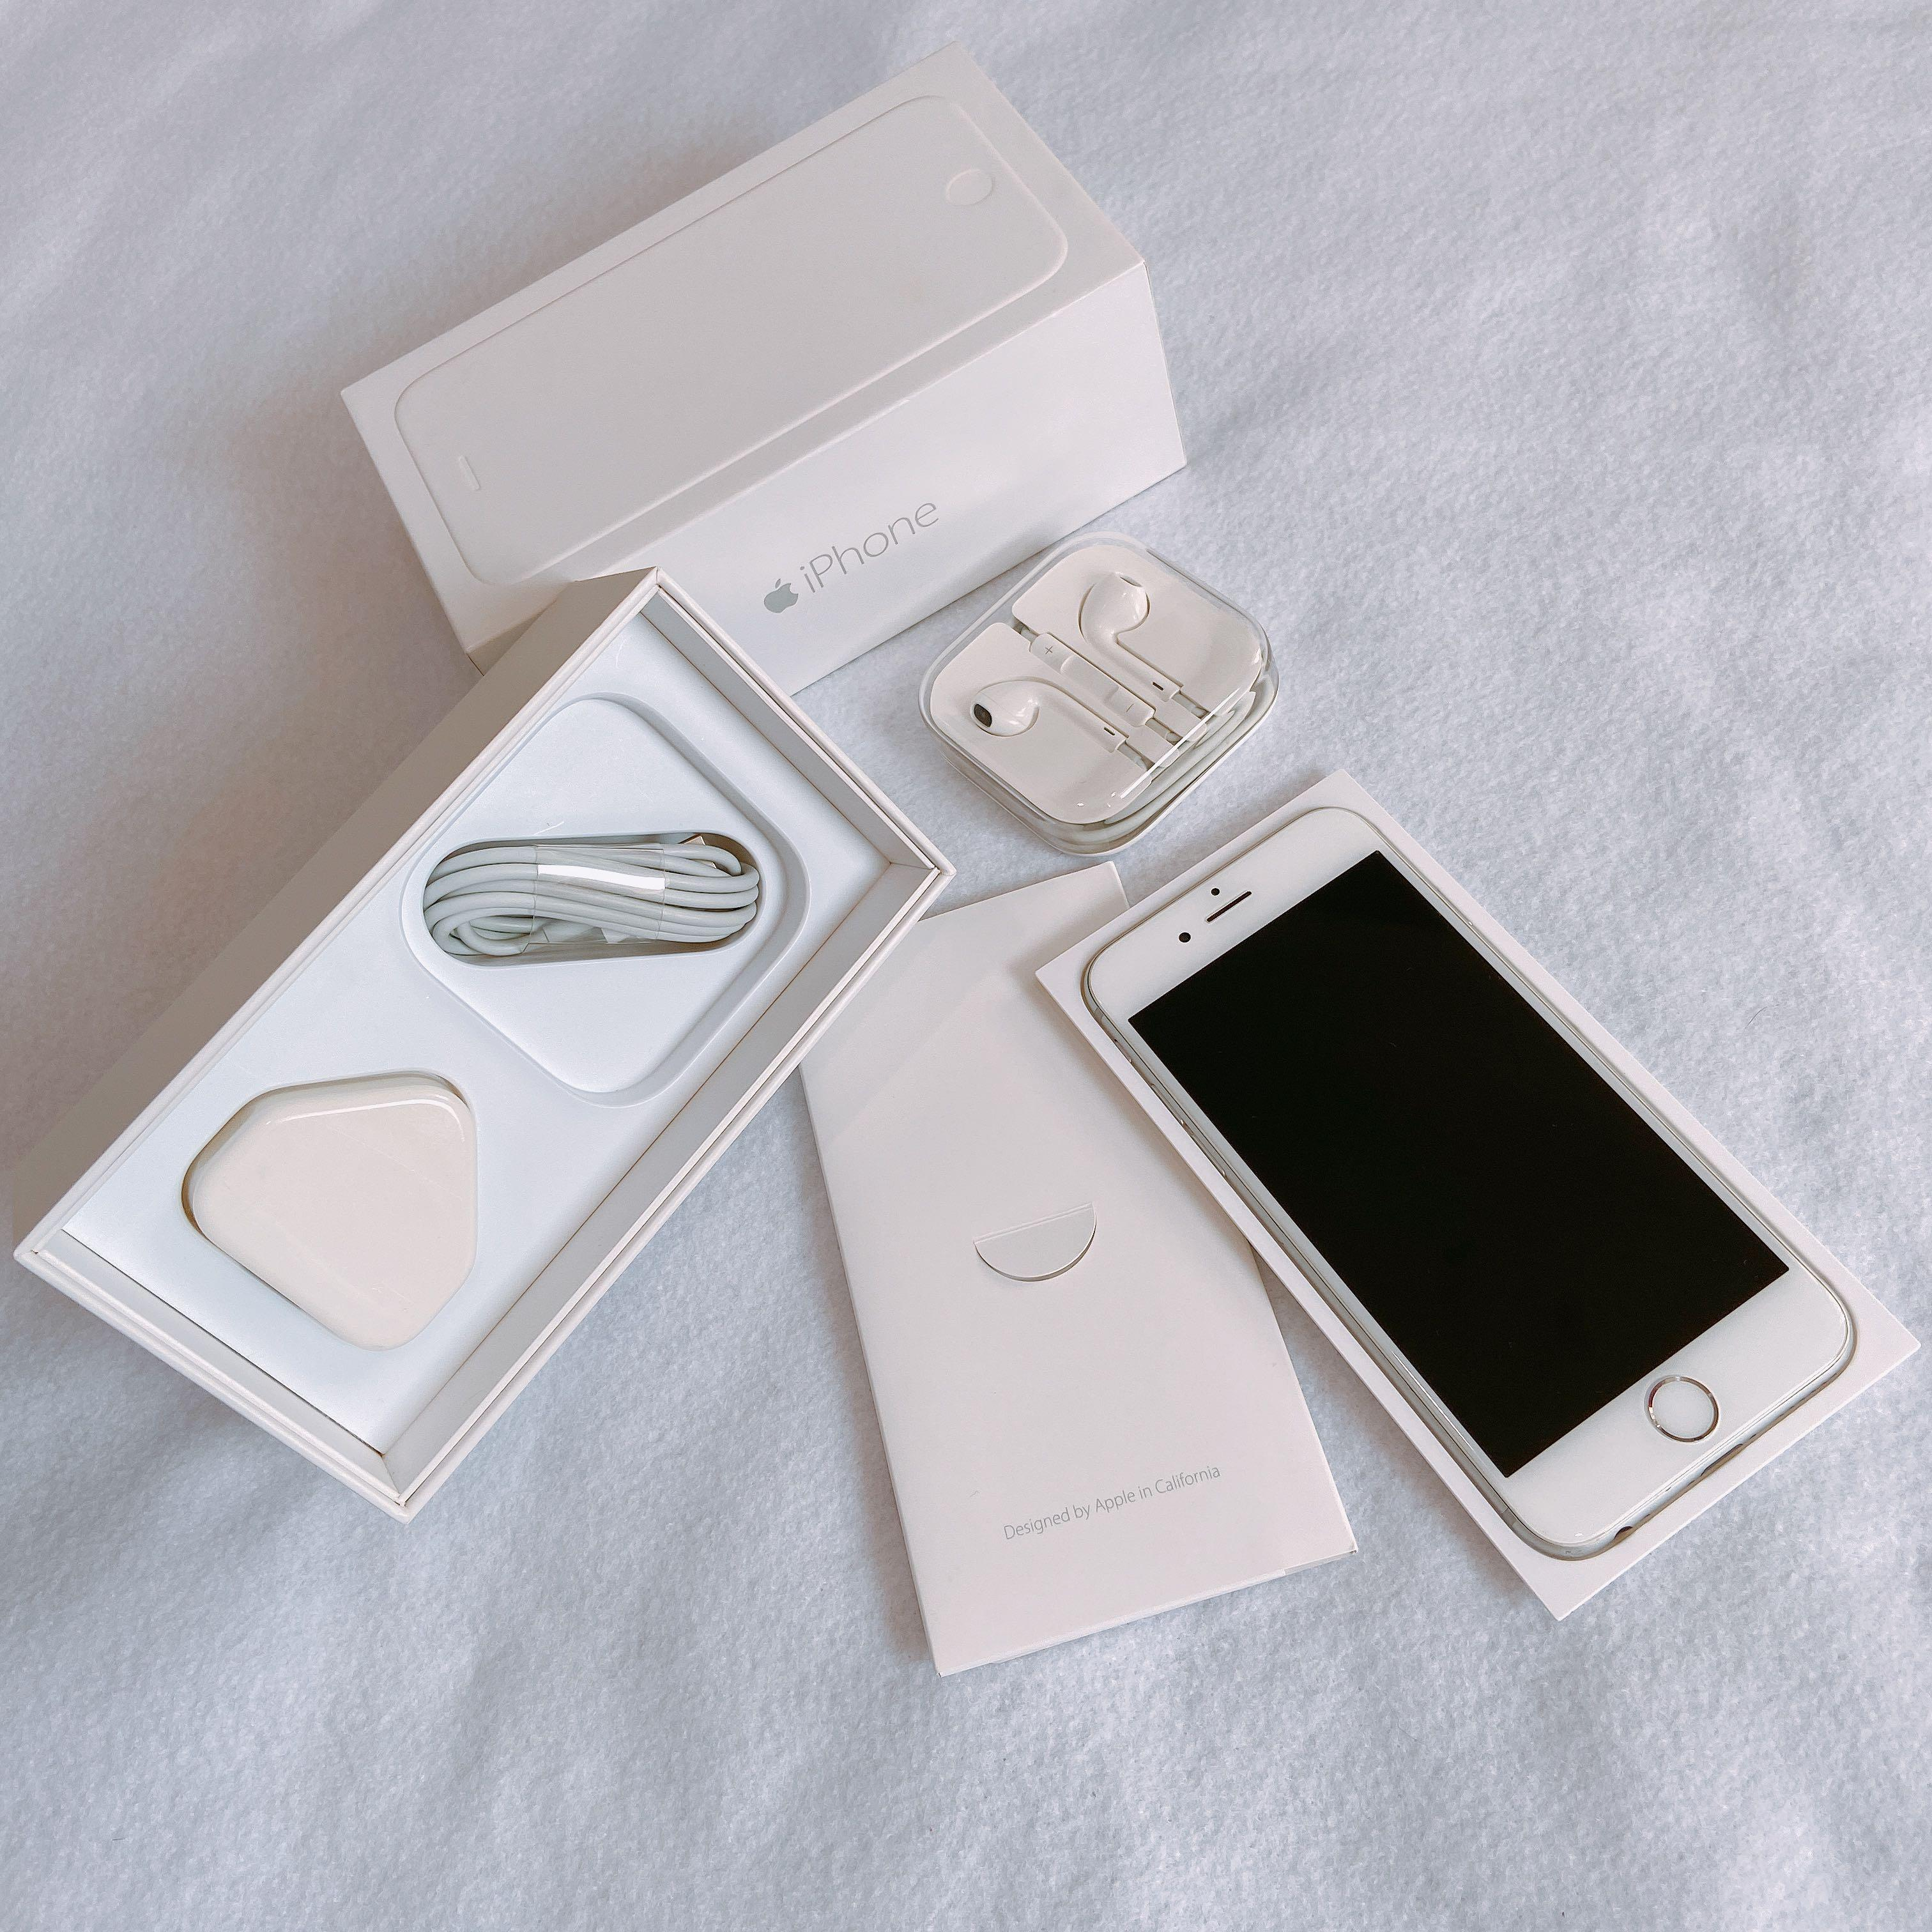 [💯% Grade A] iPhone 6 (64GB)